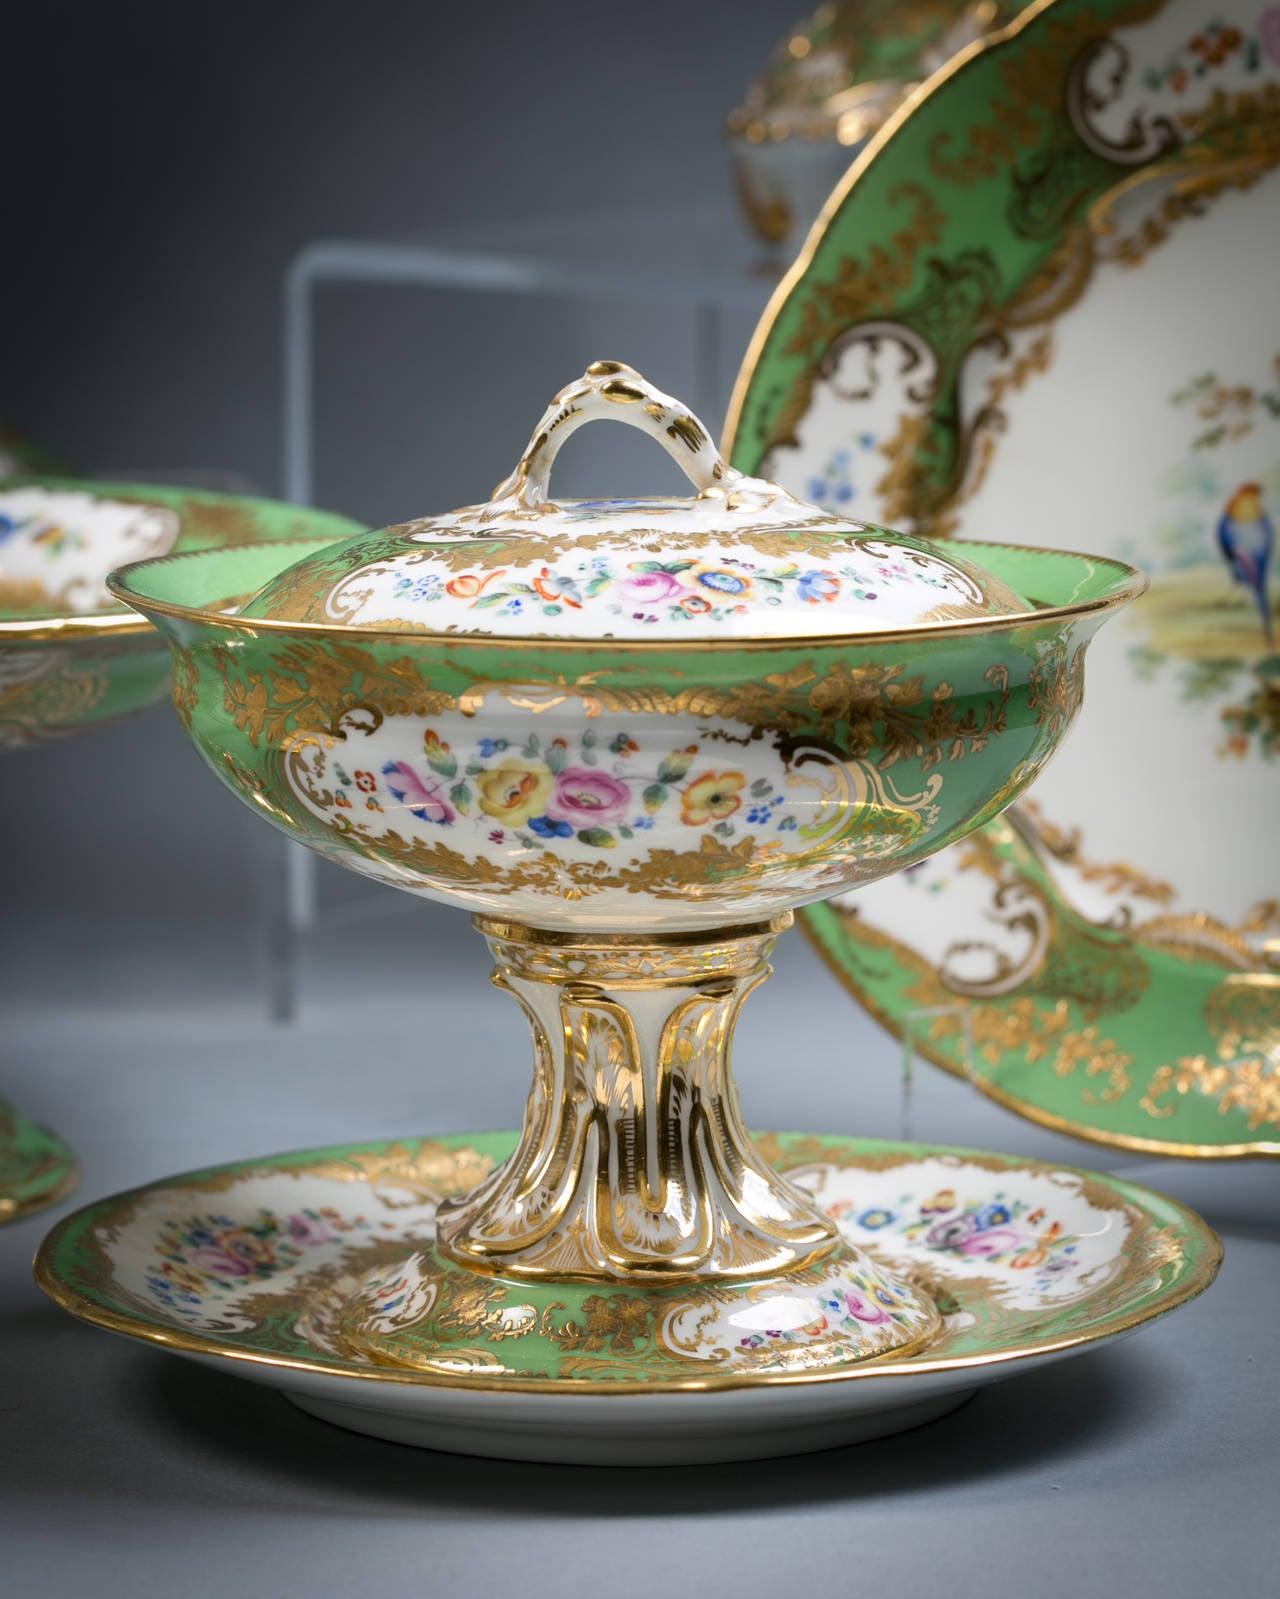 Mid-19th Century English Coalport Porcelain Dessert Service, circa 1850 For Sale